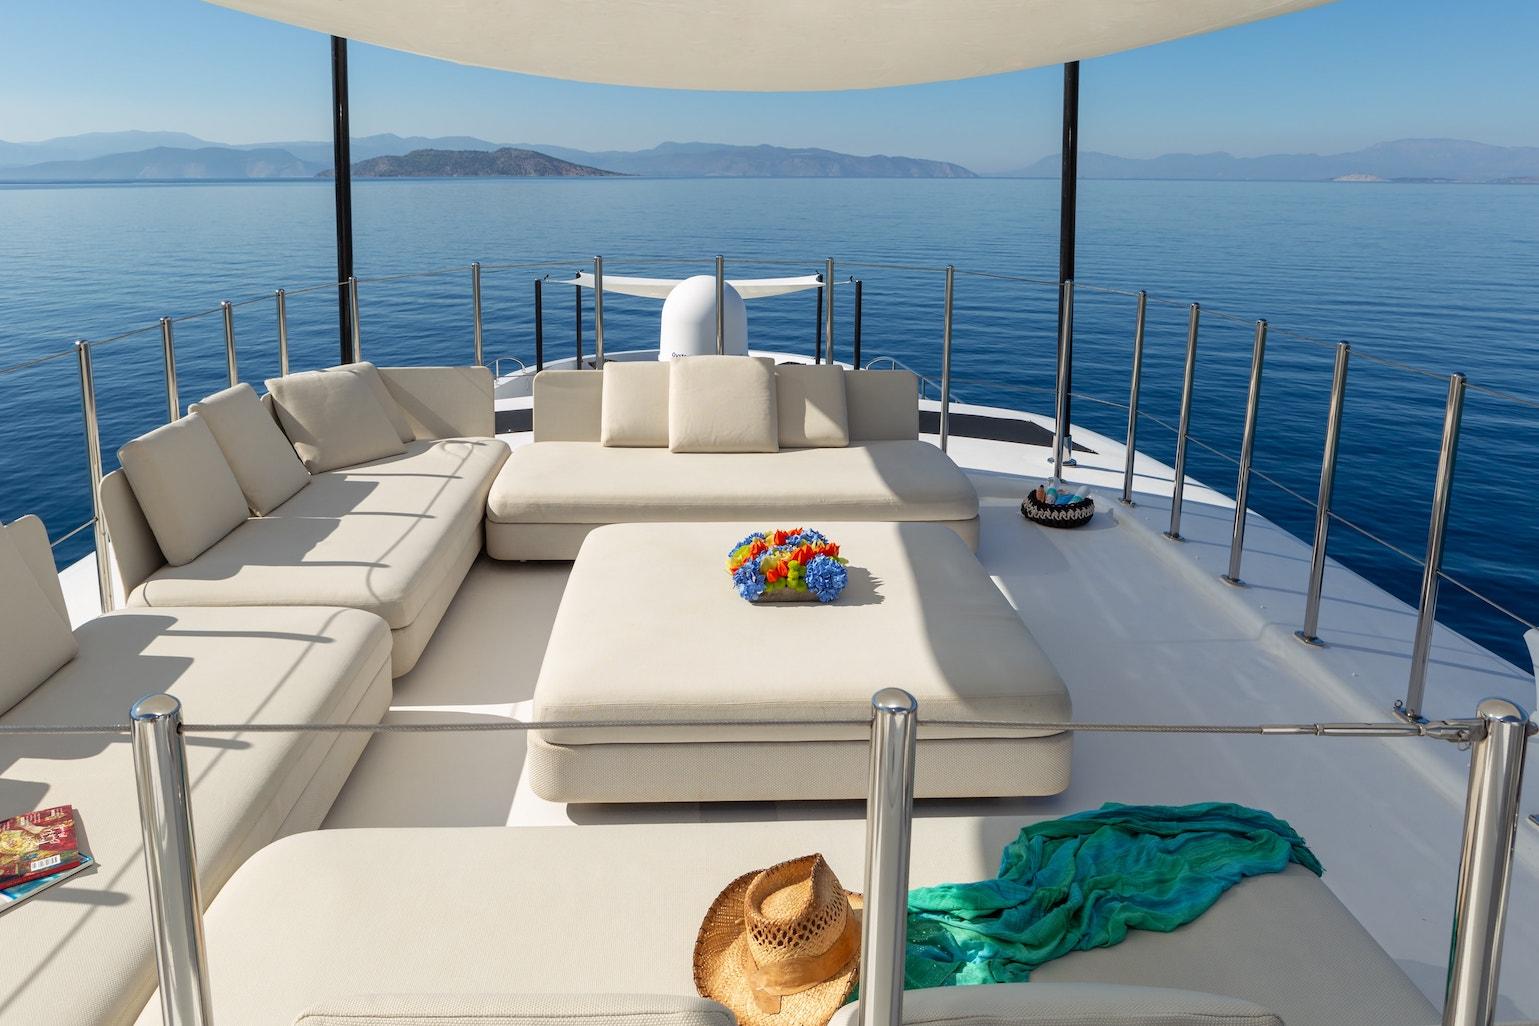 A superb lounge/ sunbathing area